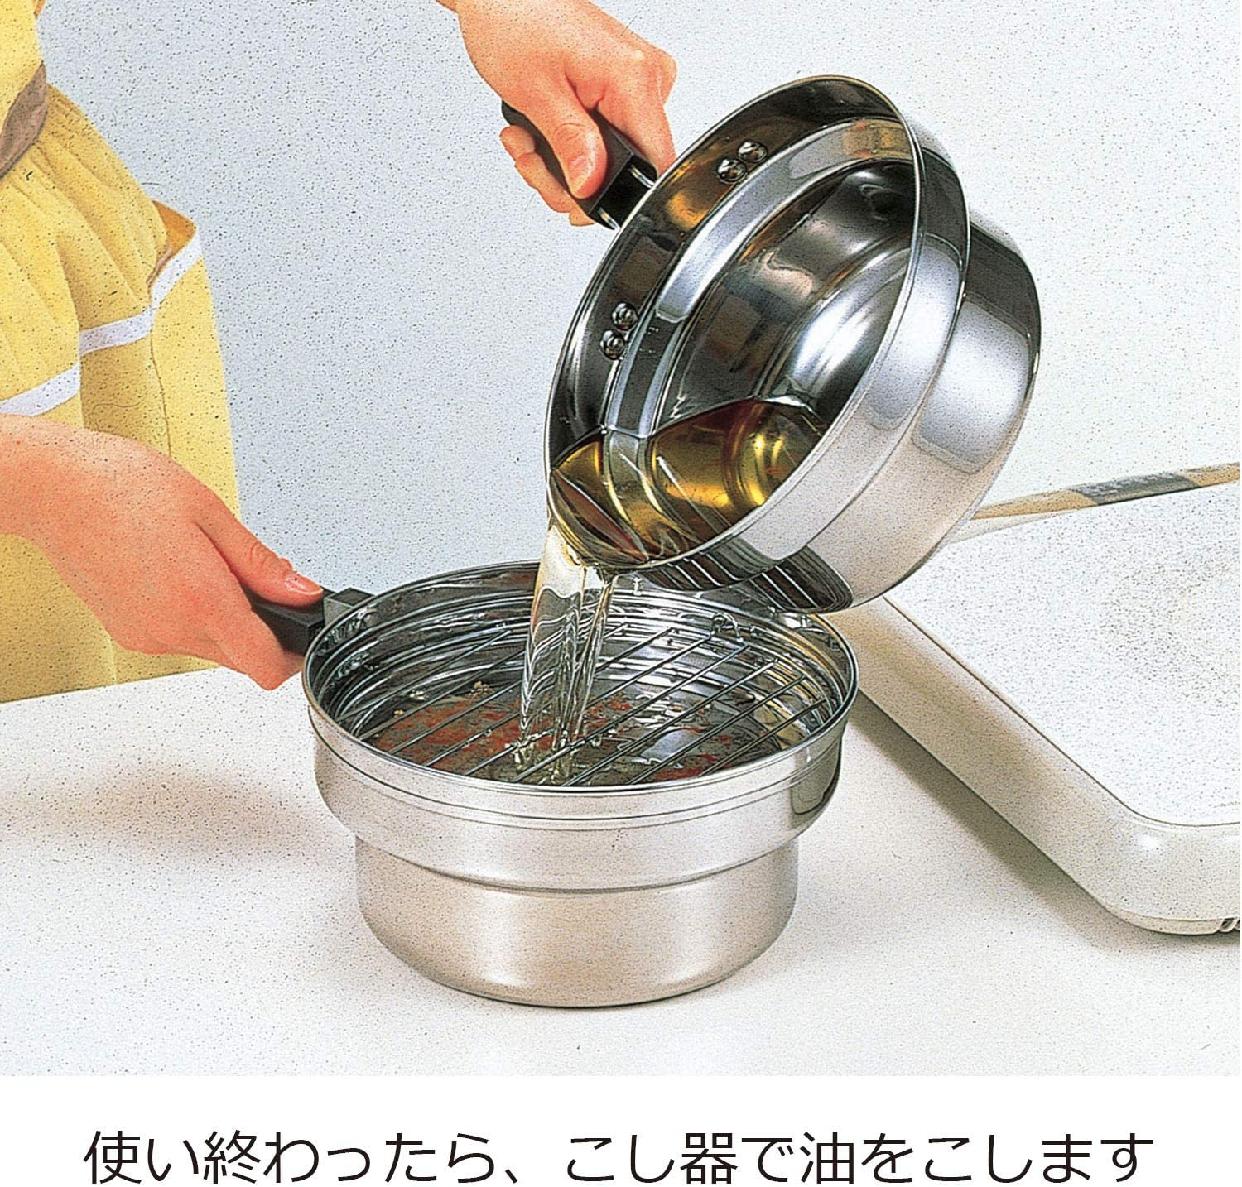 AUX(オークス)日本製 IH対応 片付け簡単 天ぷら鍋セット オイルポット 温度計付 シルバー T23の商品画像3